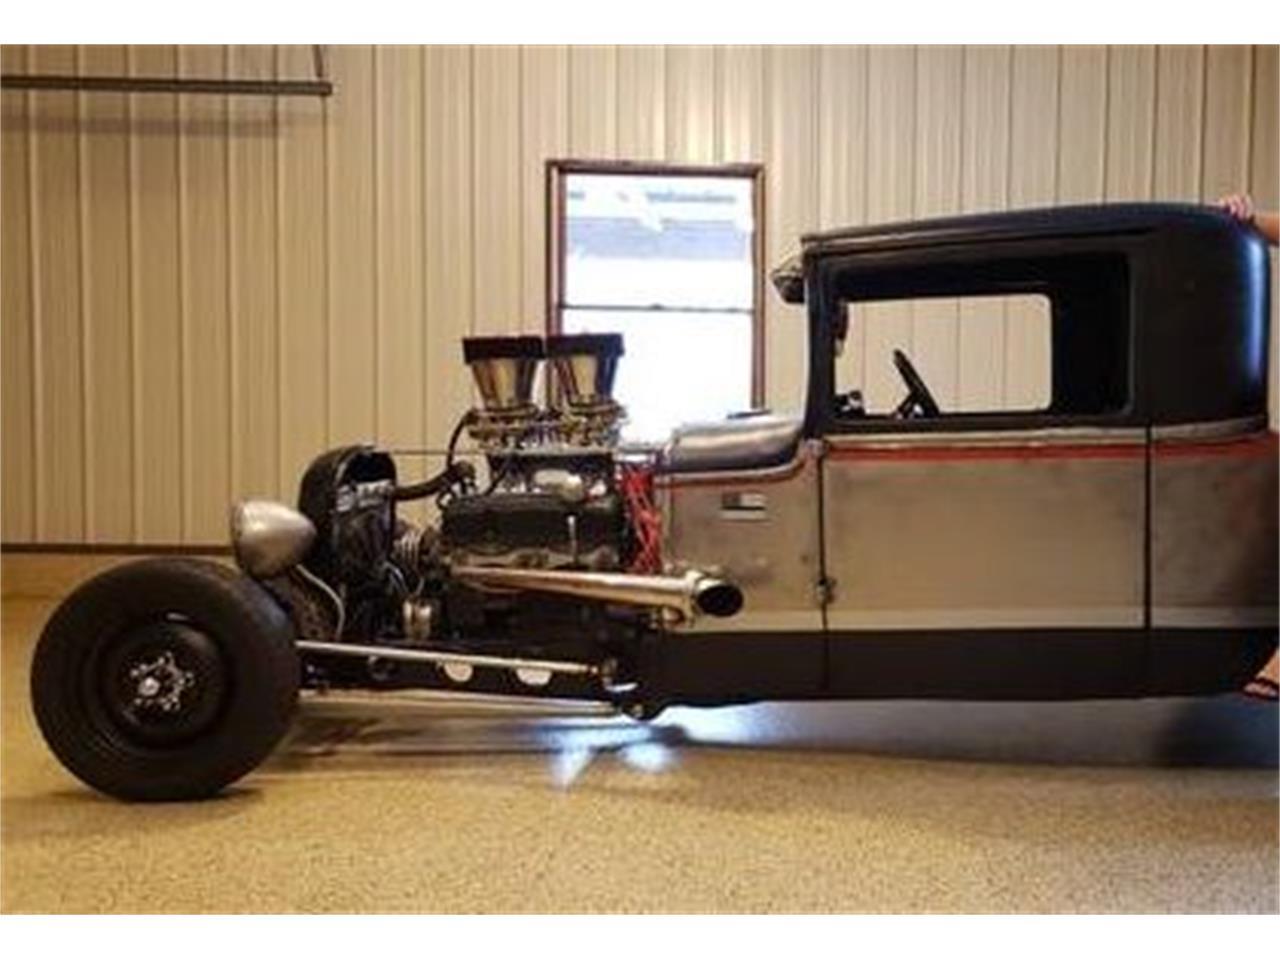 for sale 1931 dodge custom in cadillac, michigan cars - cadillac, mi at geebo